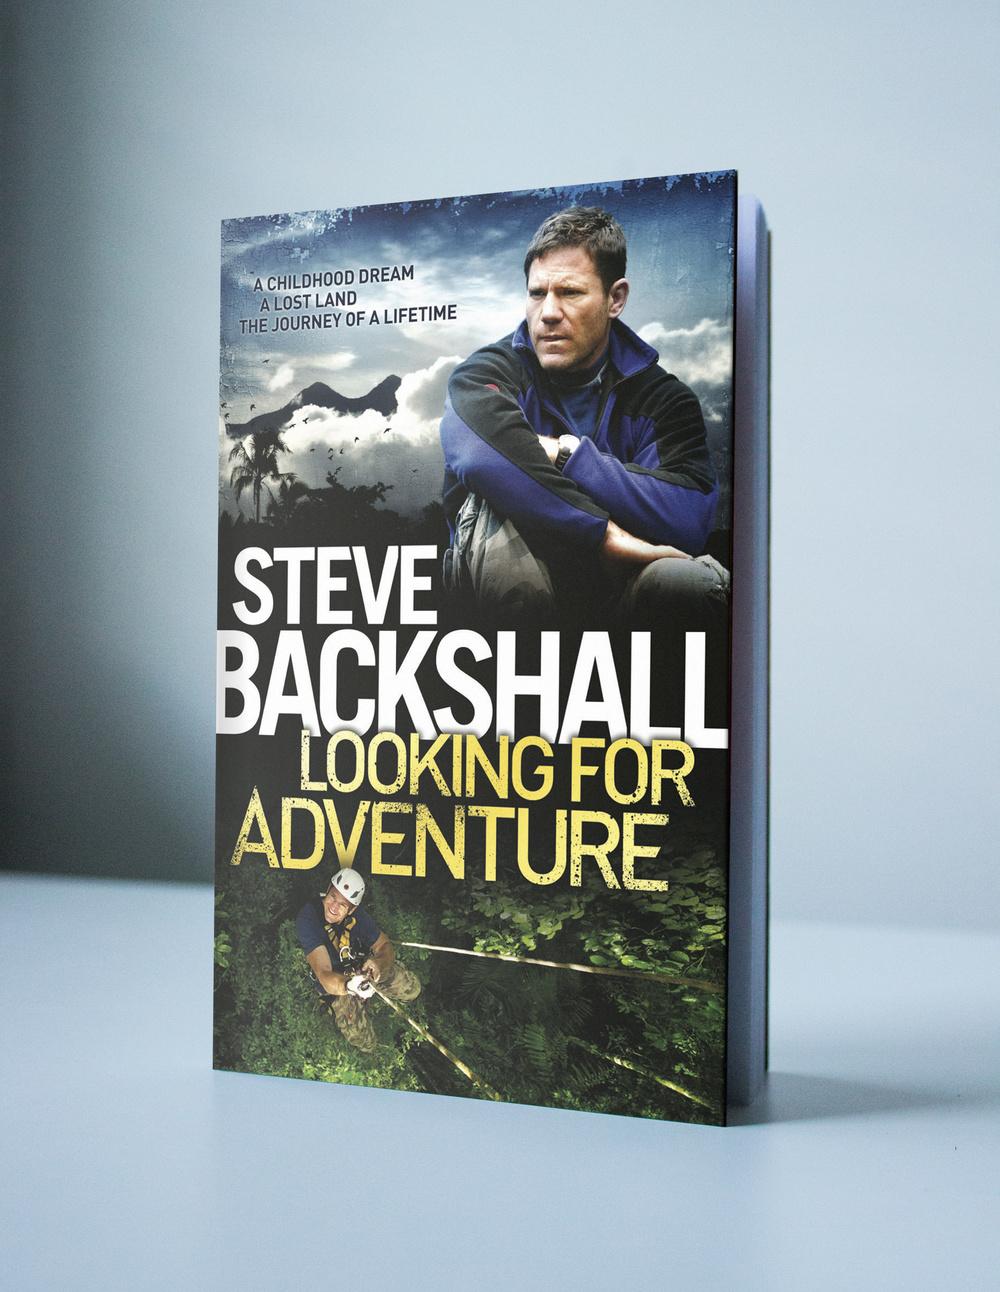 Steve Backshall Looking For Adventure